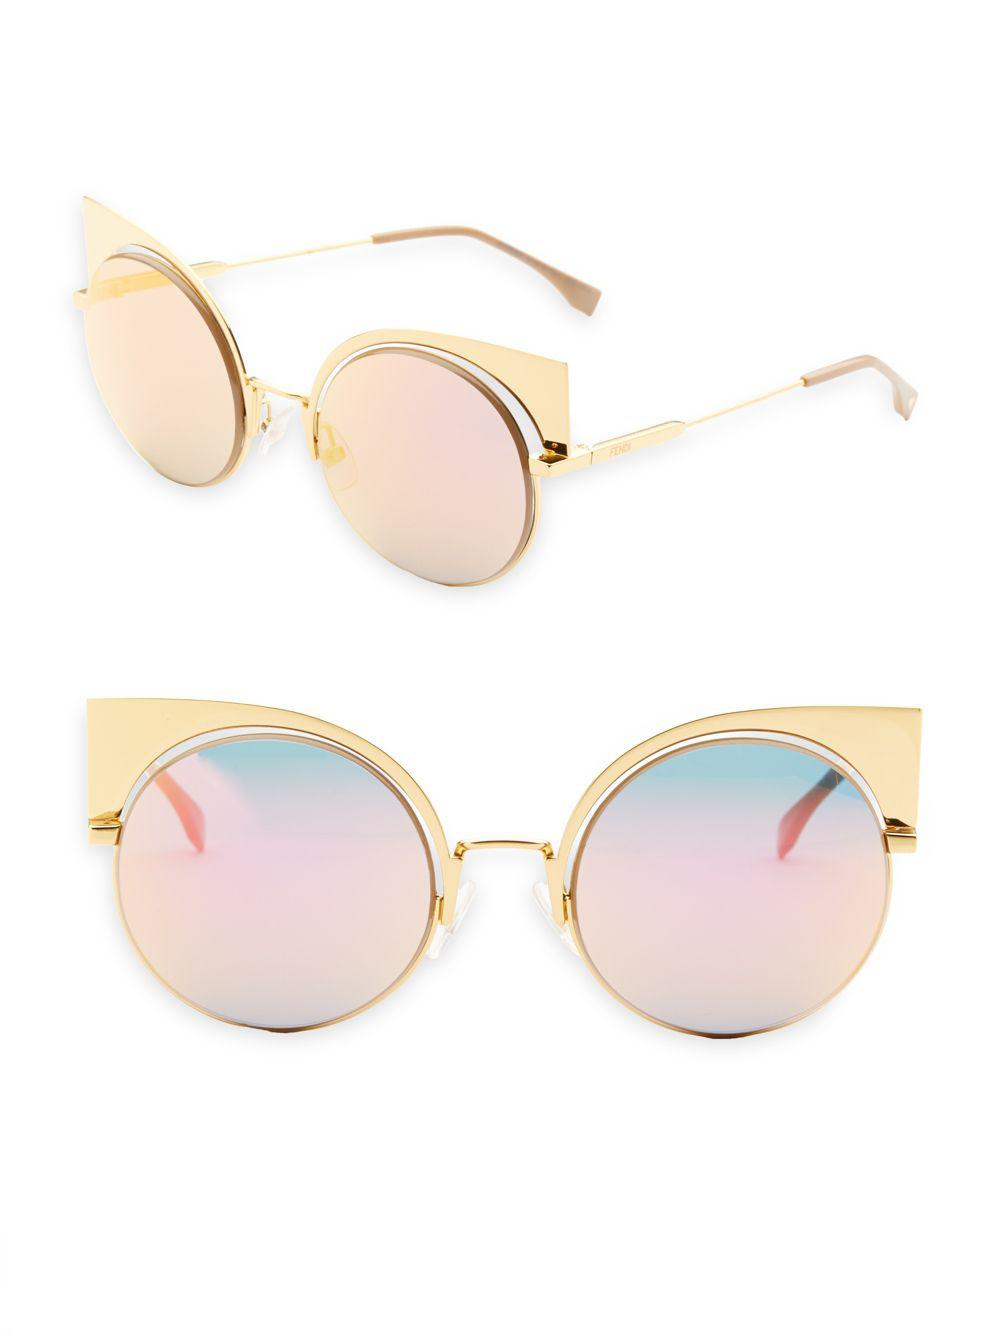 c1f5c3655f Lyst - Fendi 53mm Mirrored Cat s-eye Sunglasses in Pink